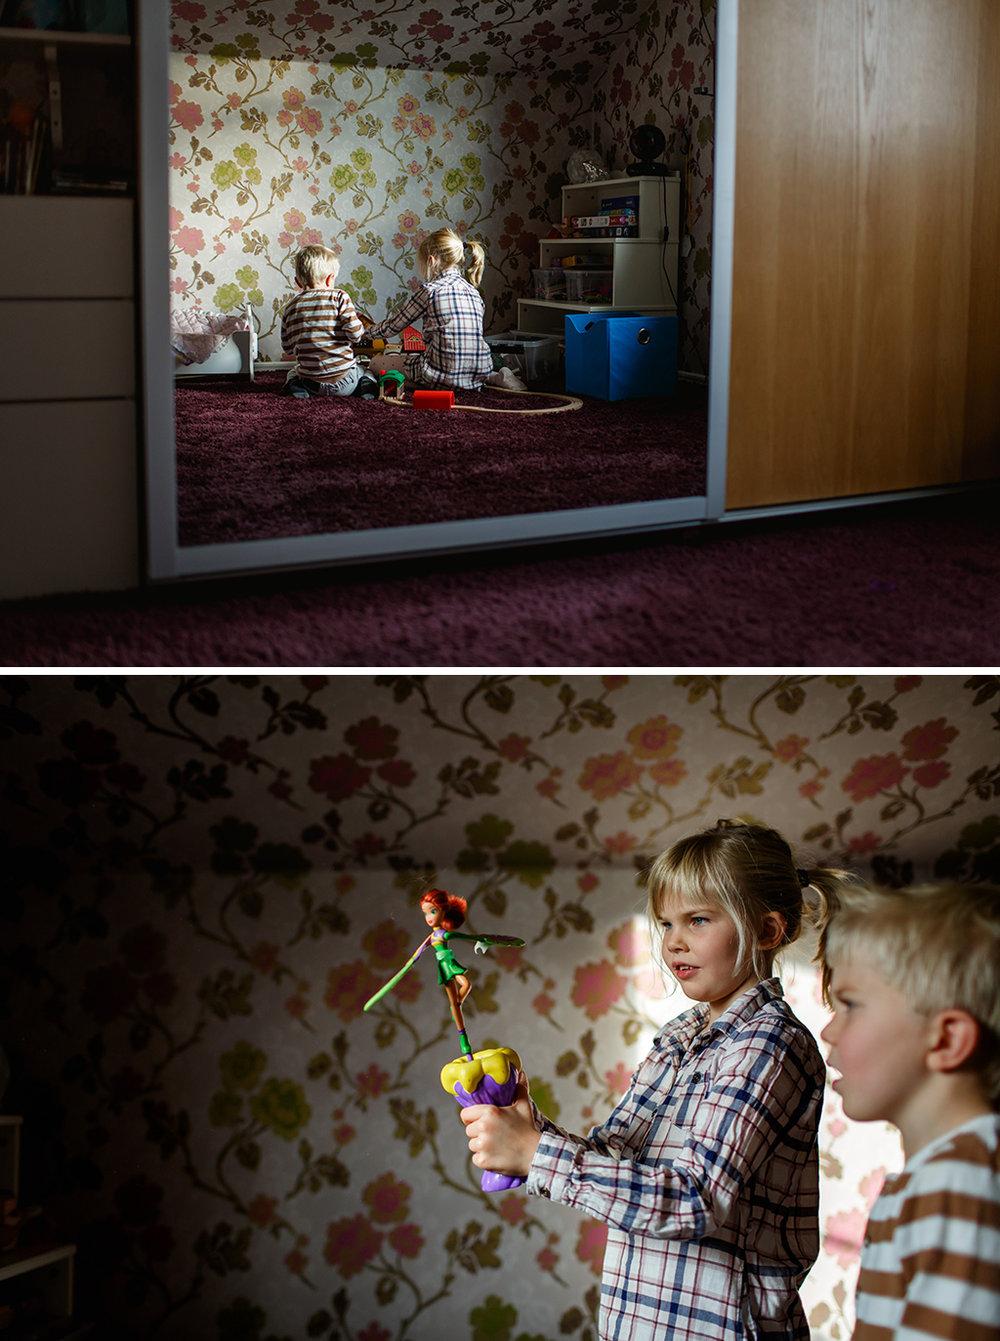 Nyfoddfotografering-lifestyle-familjefotograf-Stockholm_4.jpg